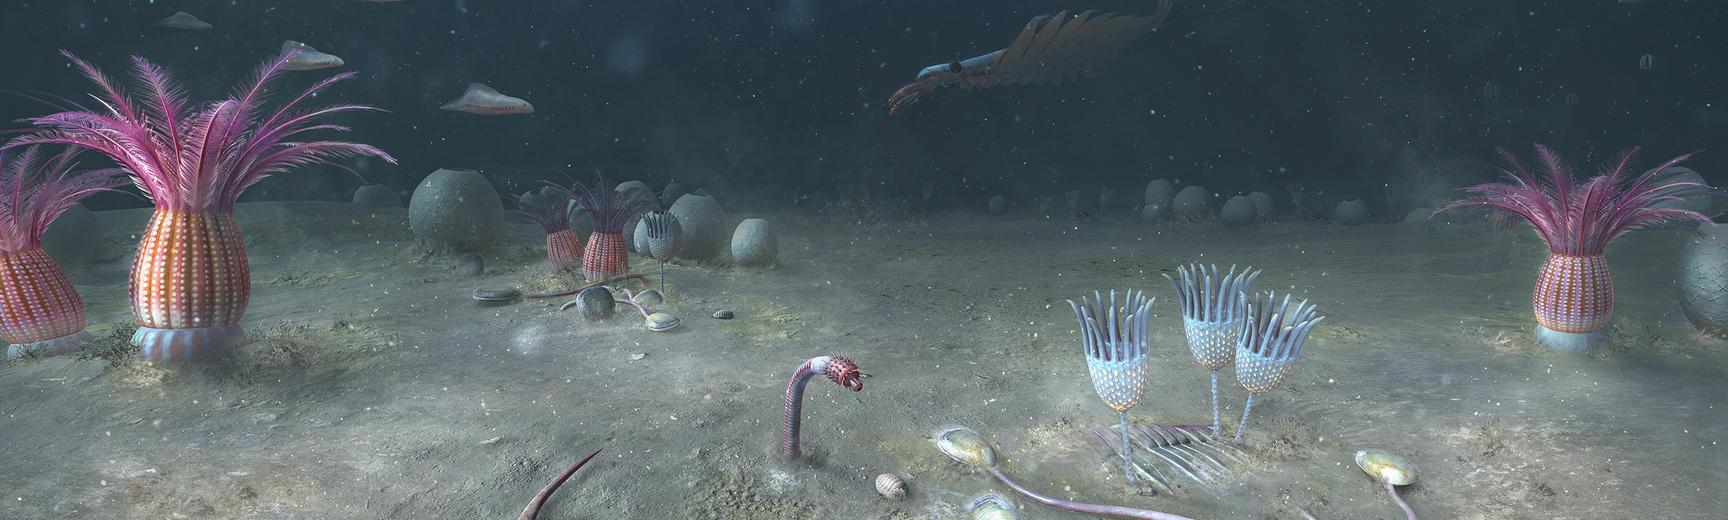 Cambrian ocean scene